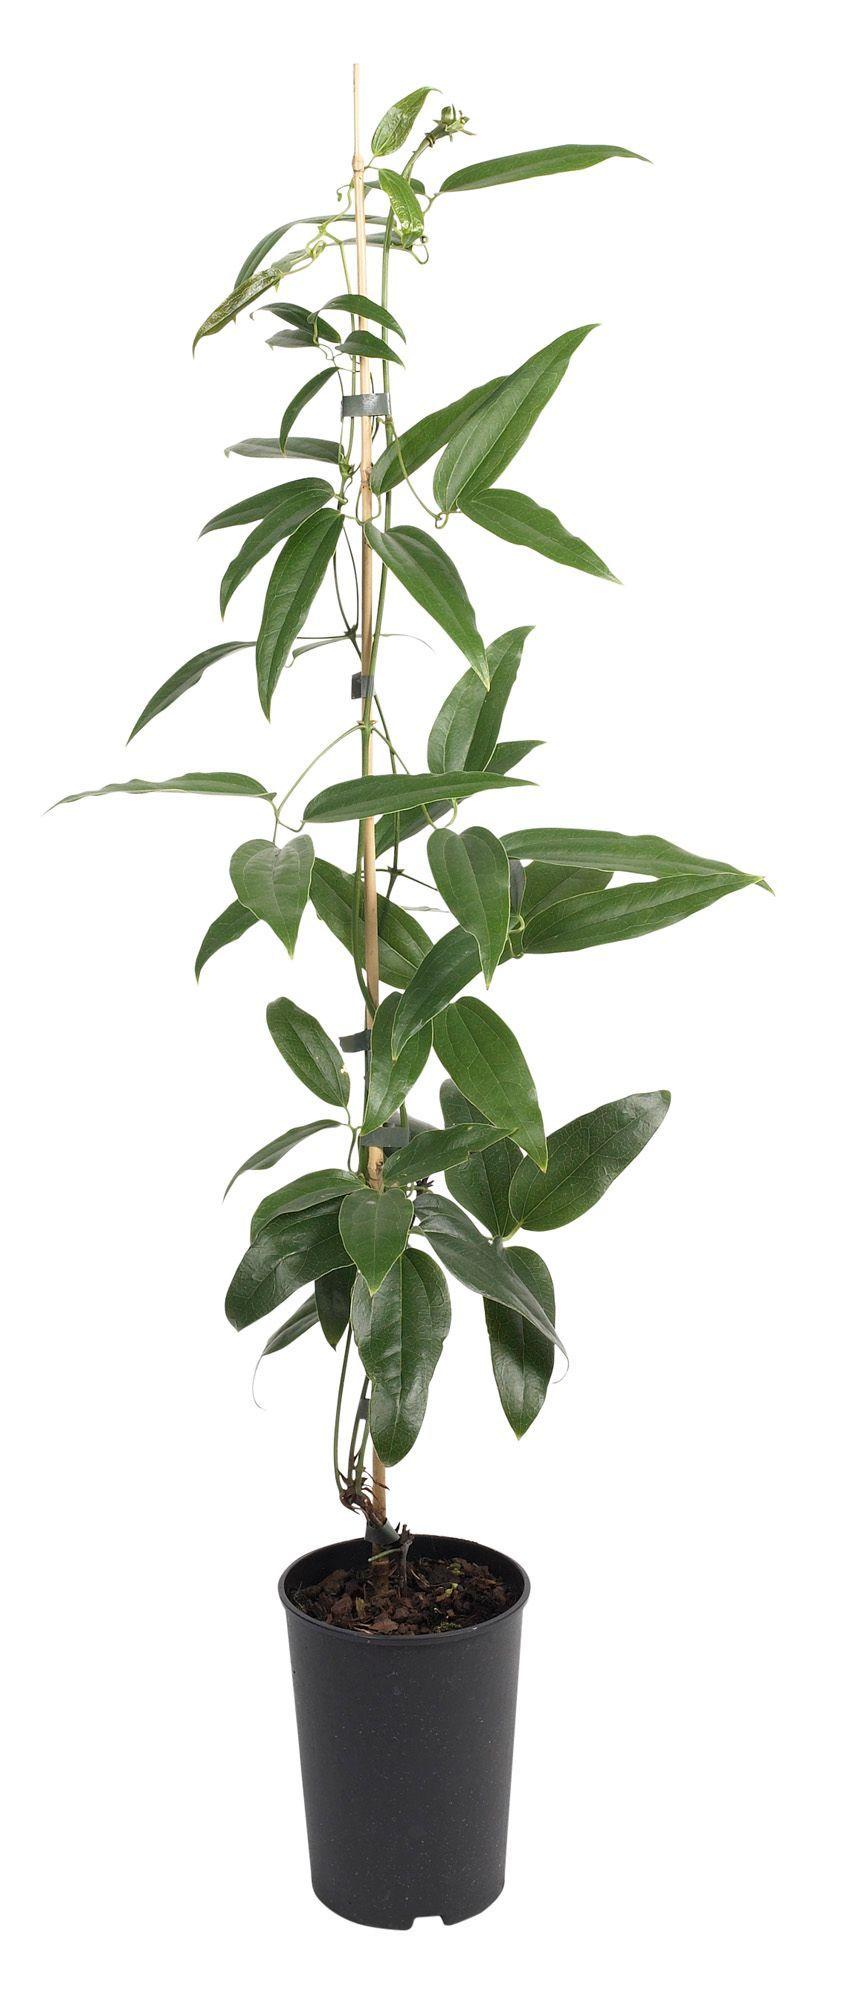 B&Q Clematis Armandii Cane In Plant Pot | Departments | DIY at B&Q